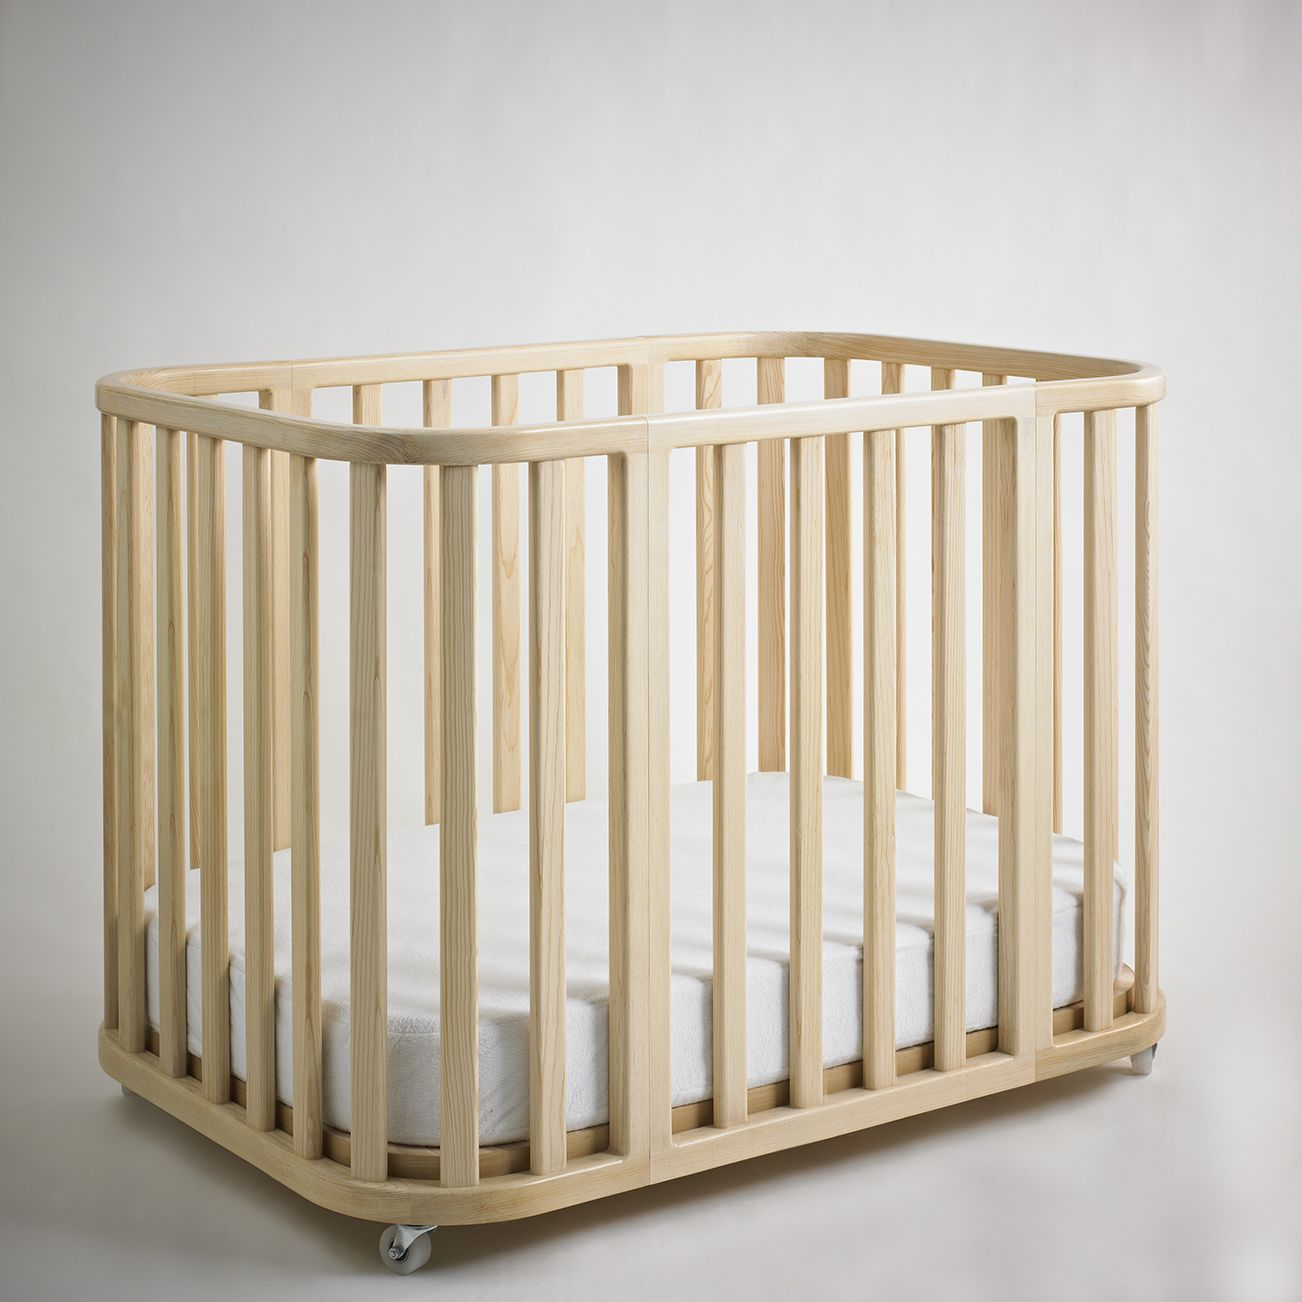 Amaya Crib convertible into Moses & Toddler Bed. Design by Valeria Tamayo.